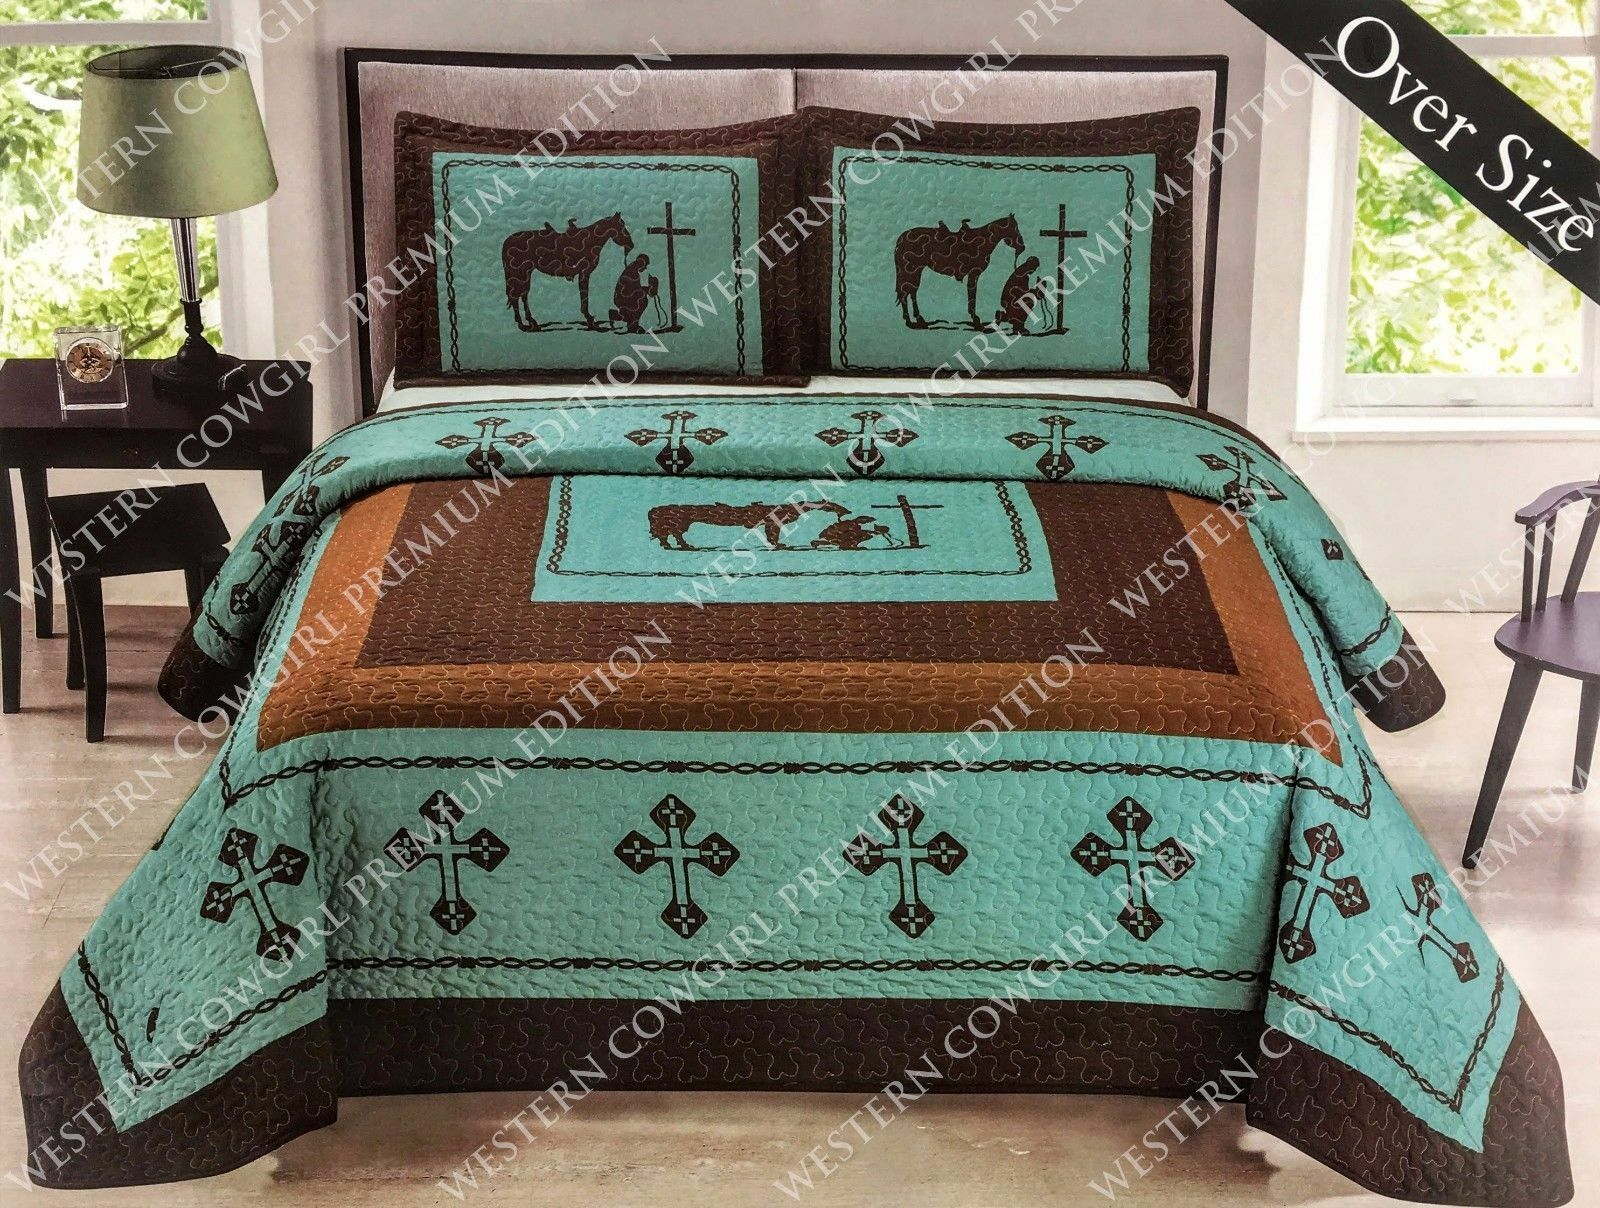 Texas Cross Praying Cowboy Western Quilt Bedspread